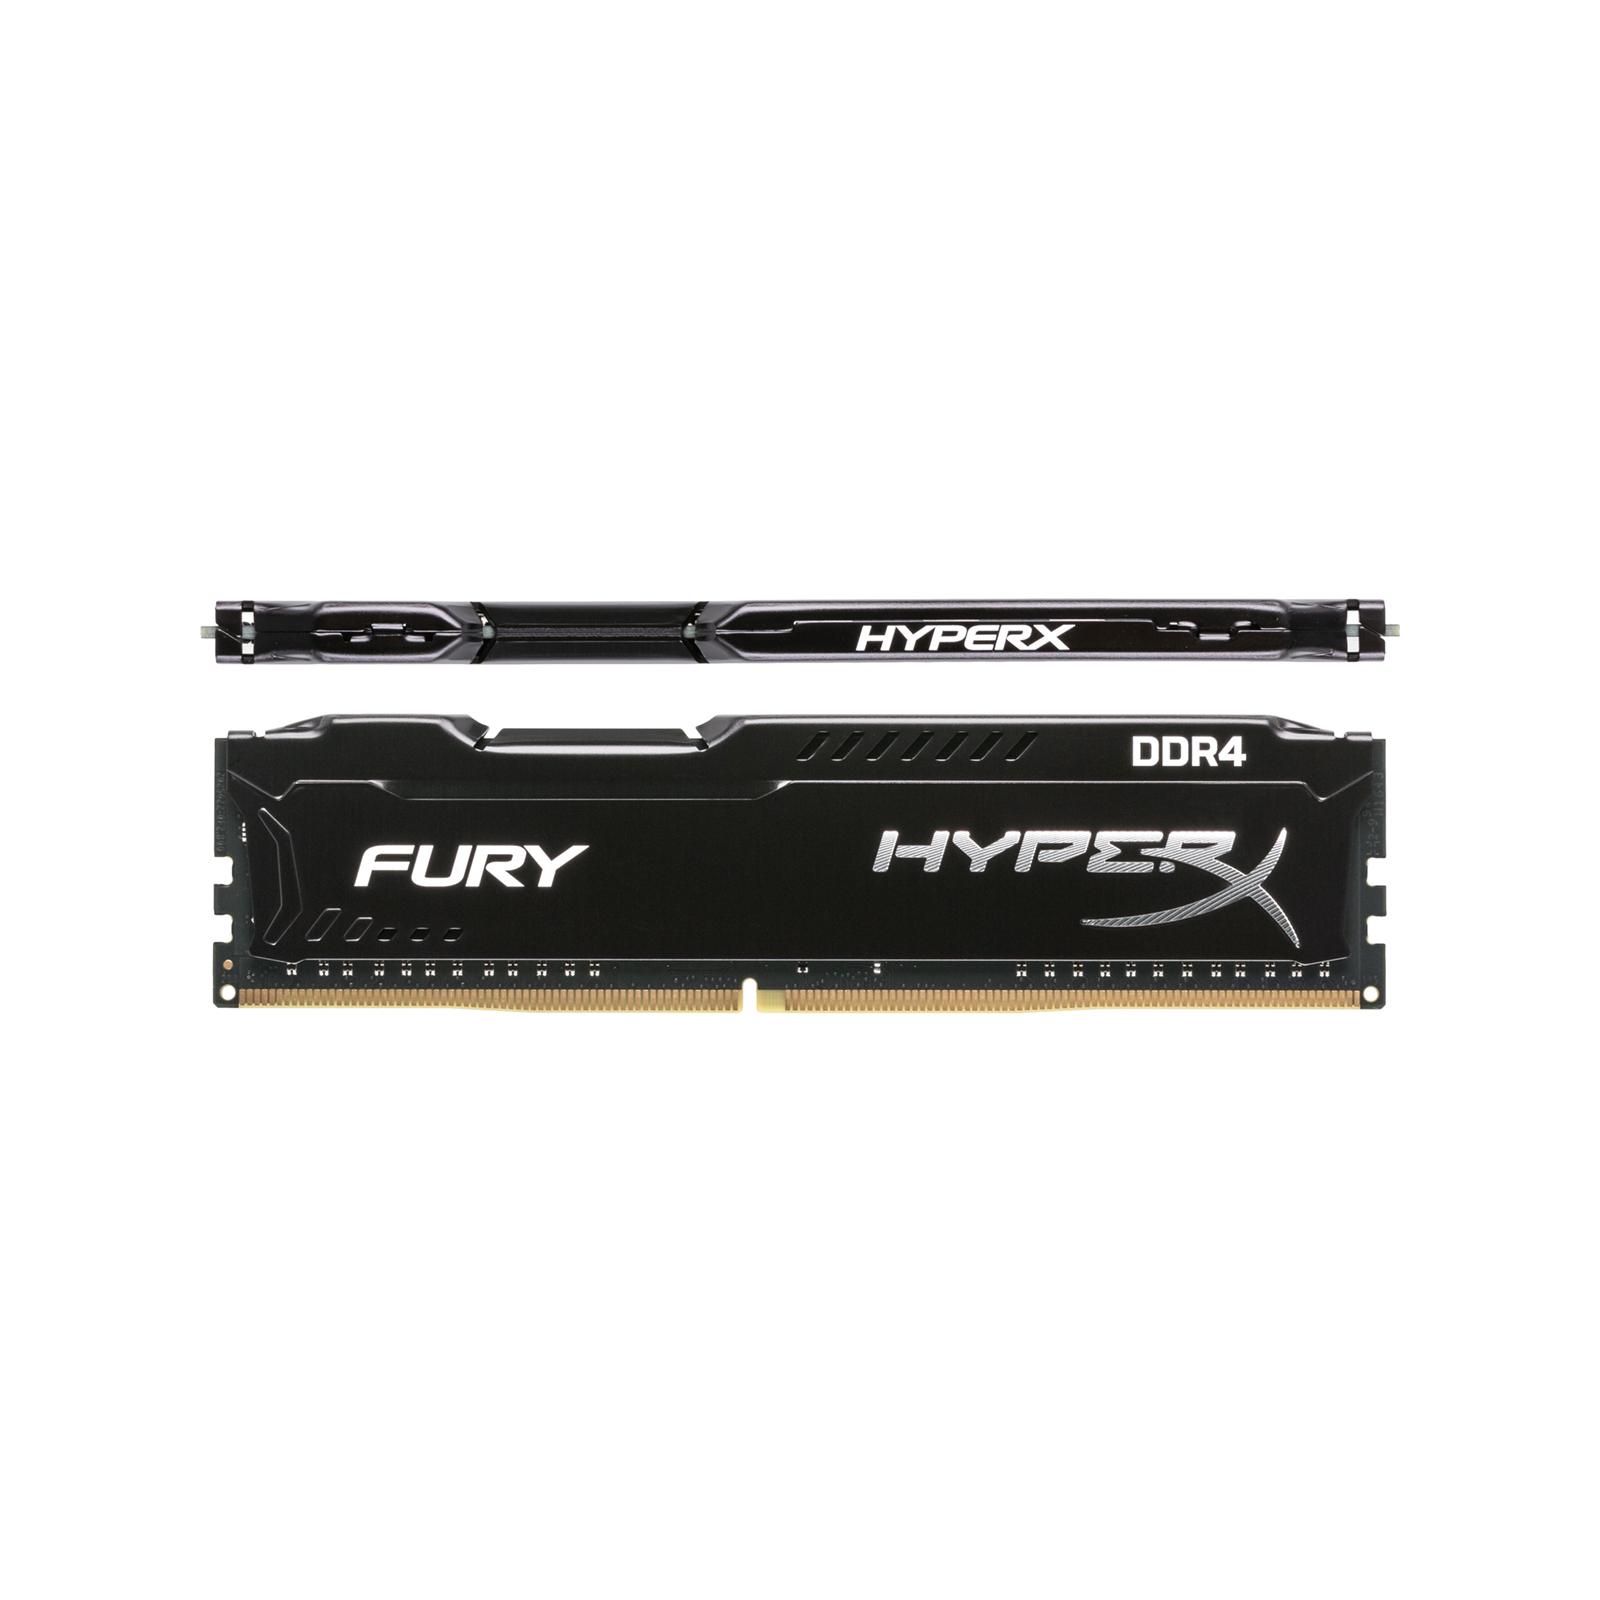 Модуль памяти для компьютера DDR4 16GB (2x8GB) 2133 MHz HyperX FURY Black HyperX (Kingston Fury) (HX421C14FB2K2/16) изображение 3